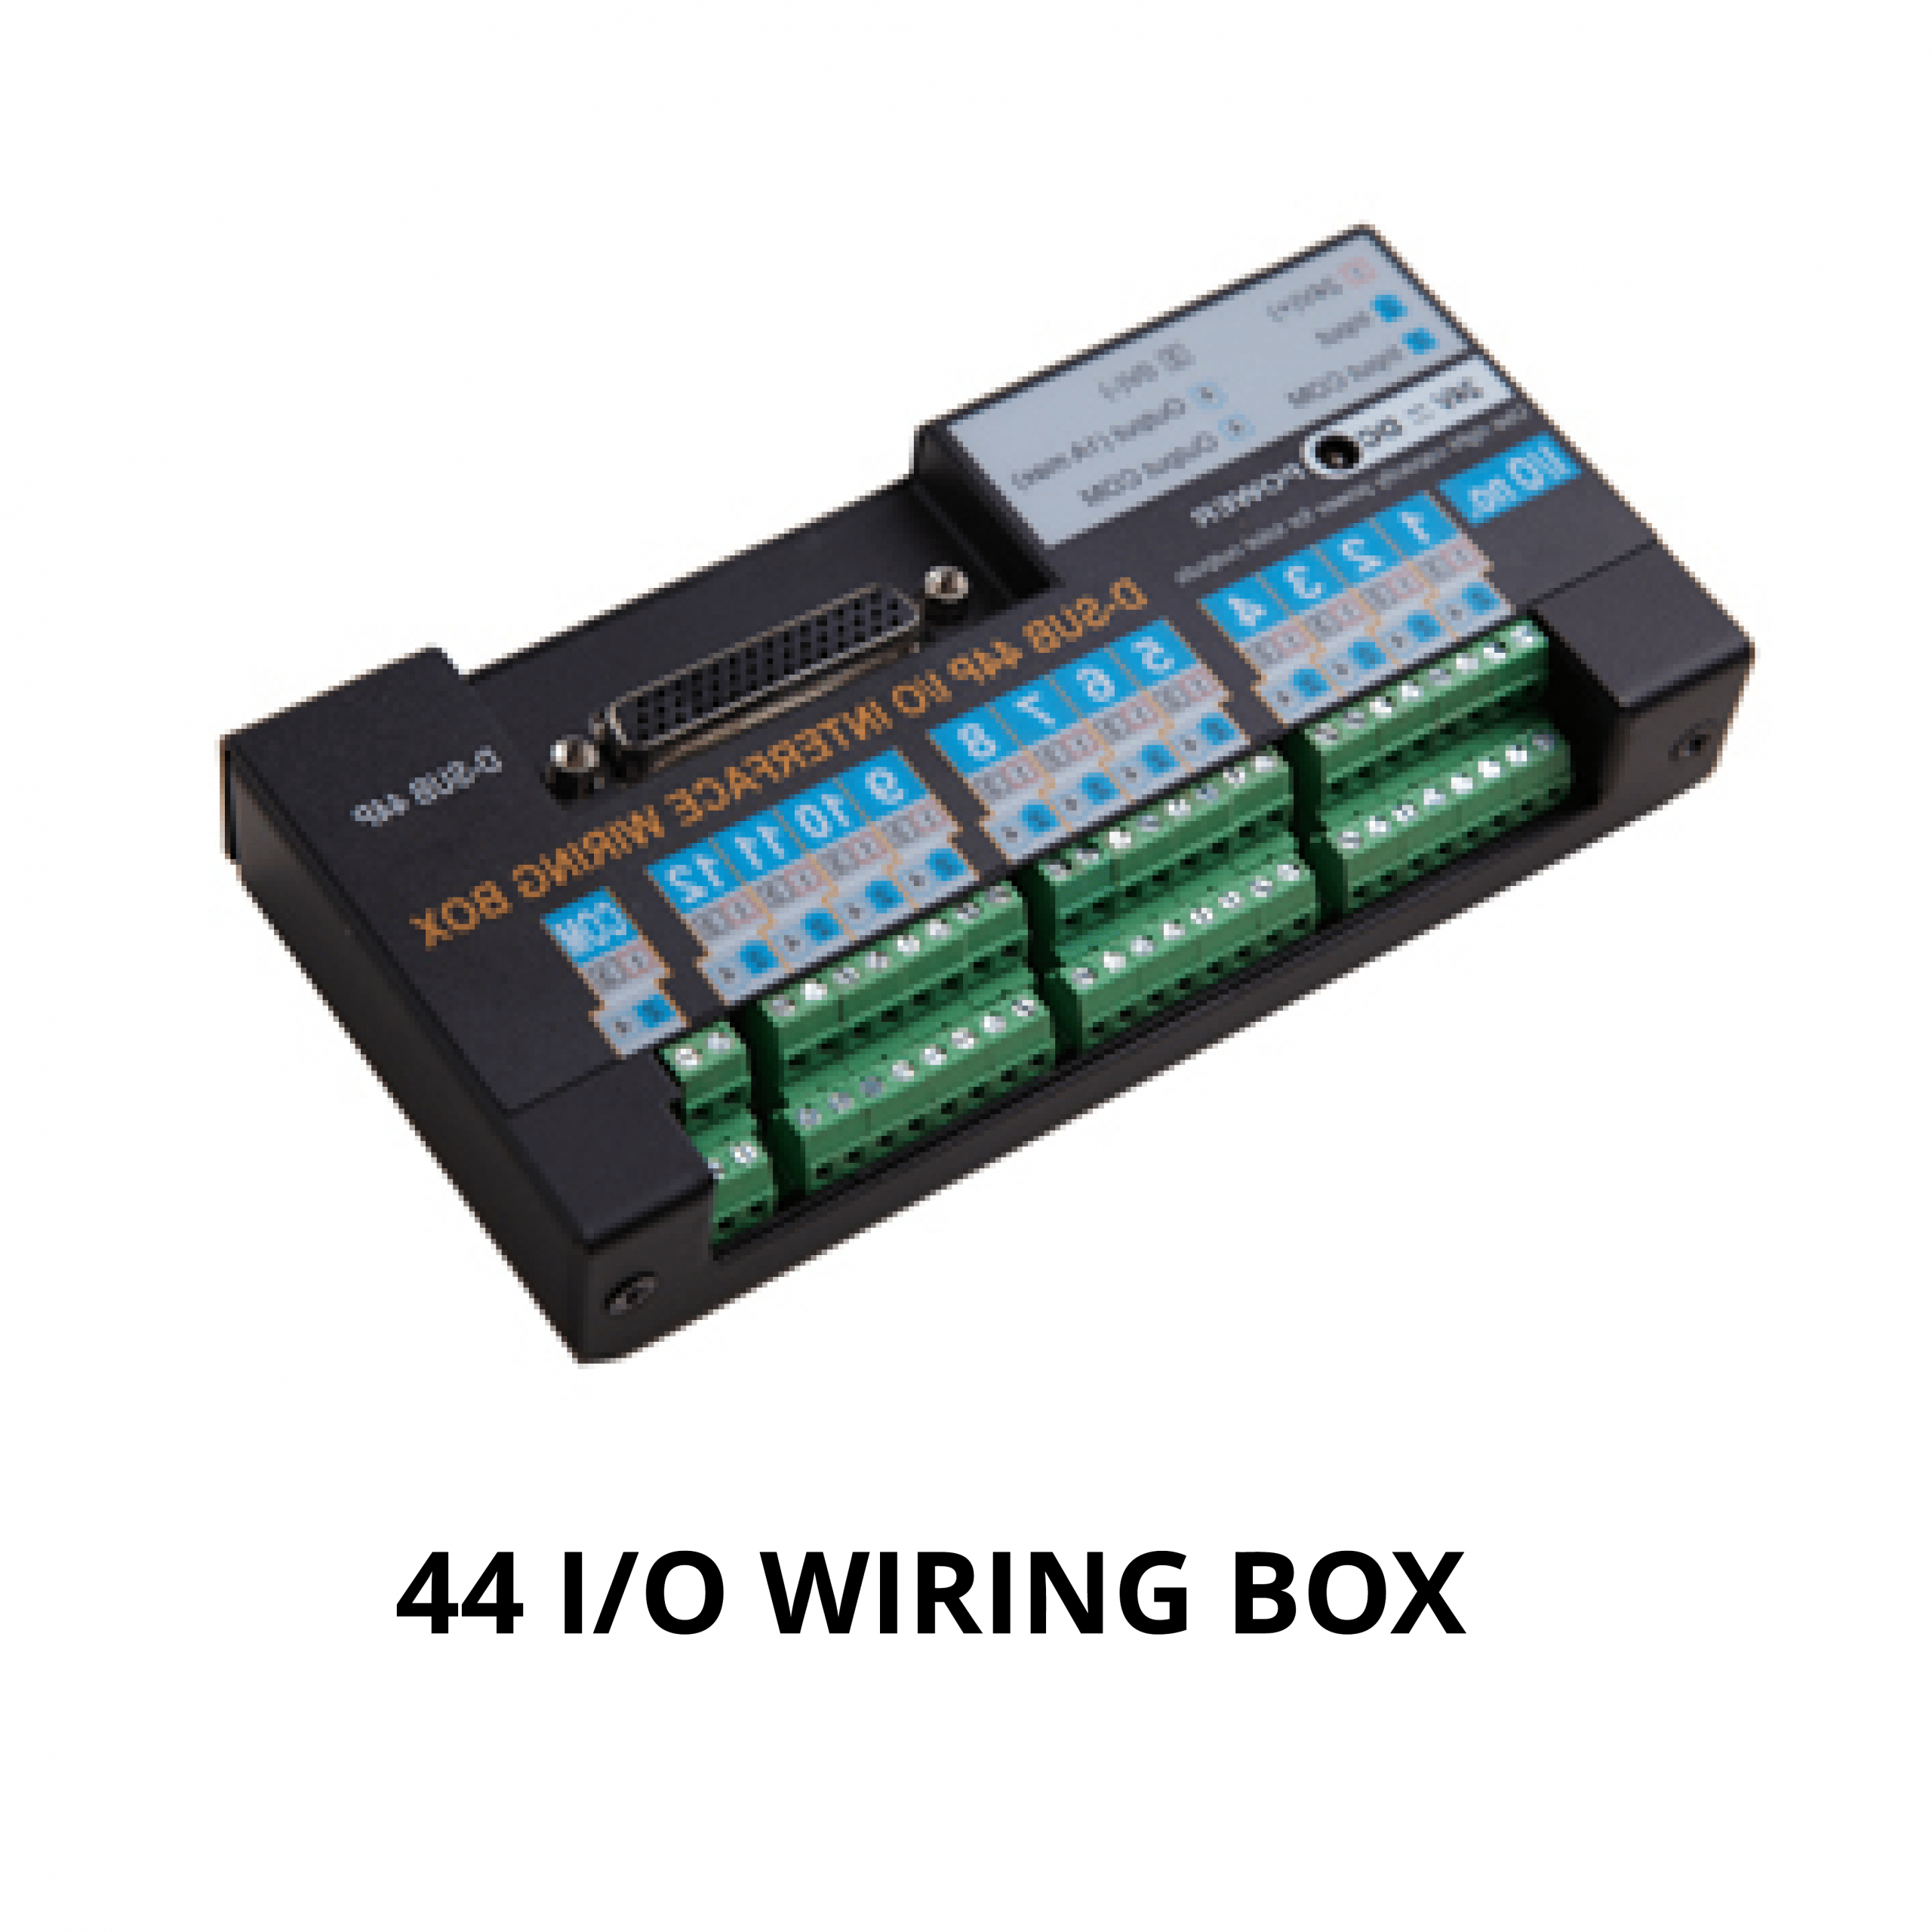 MOUNTZ MD SERIE 44P I O WIRING BOX 2 Avvitatori per assemblaggio industriale